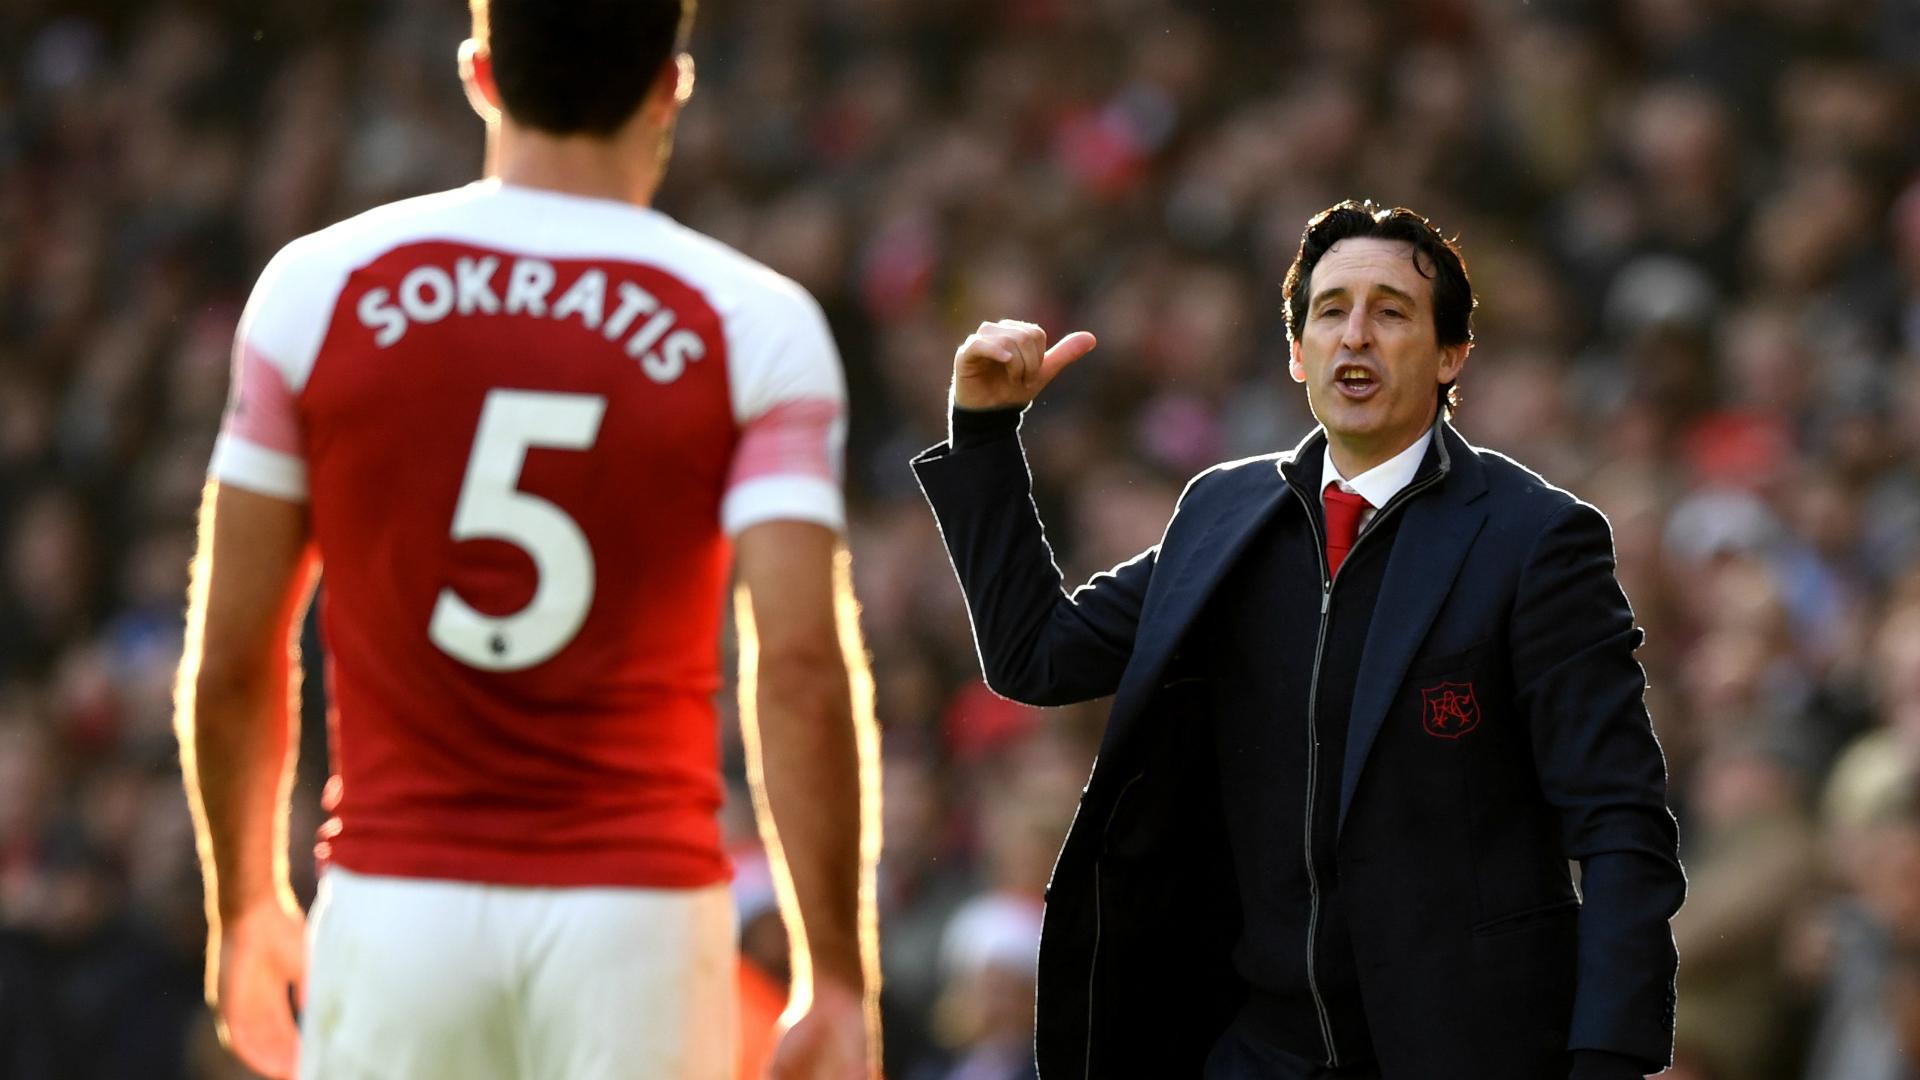 Sokratis: Arsenal boss Emery the best coach of my career